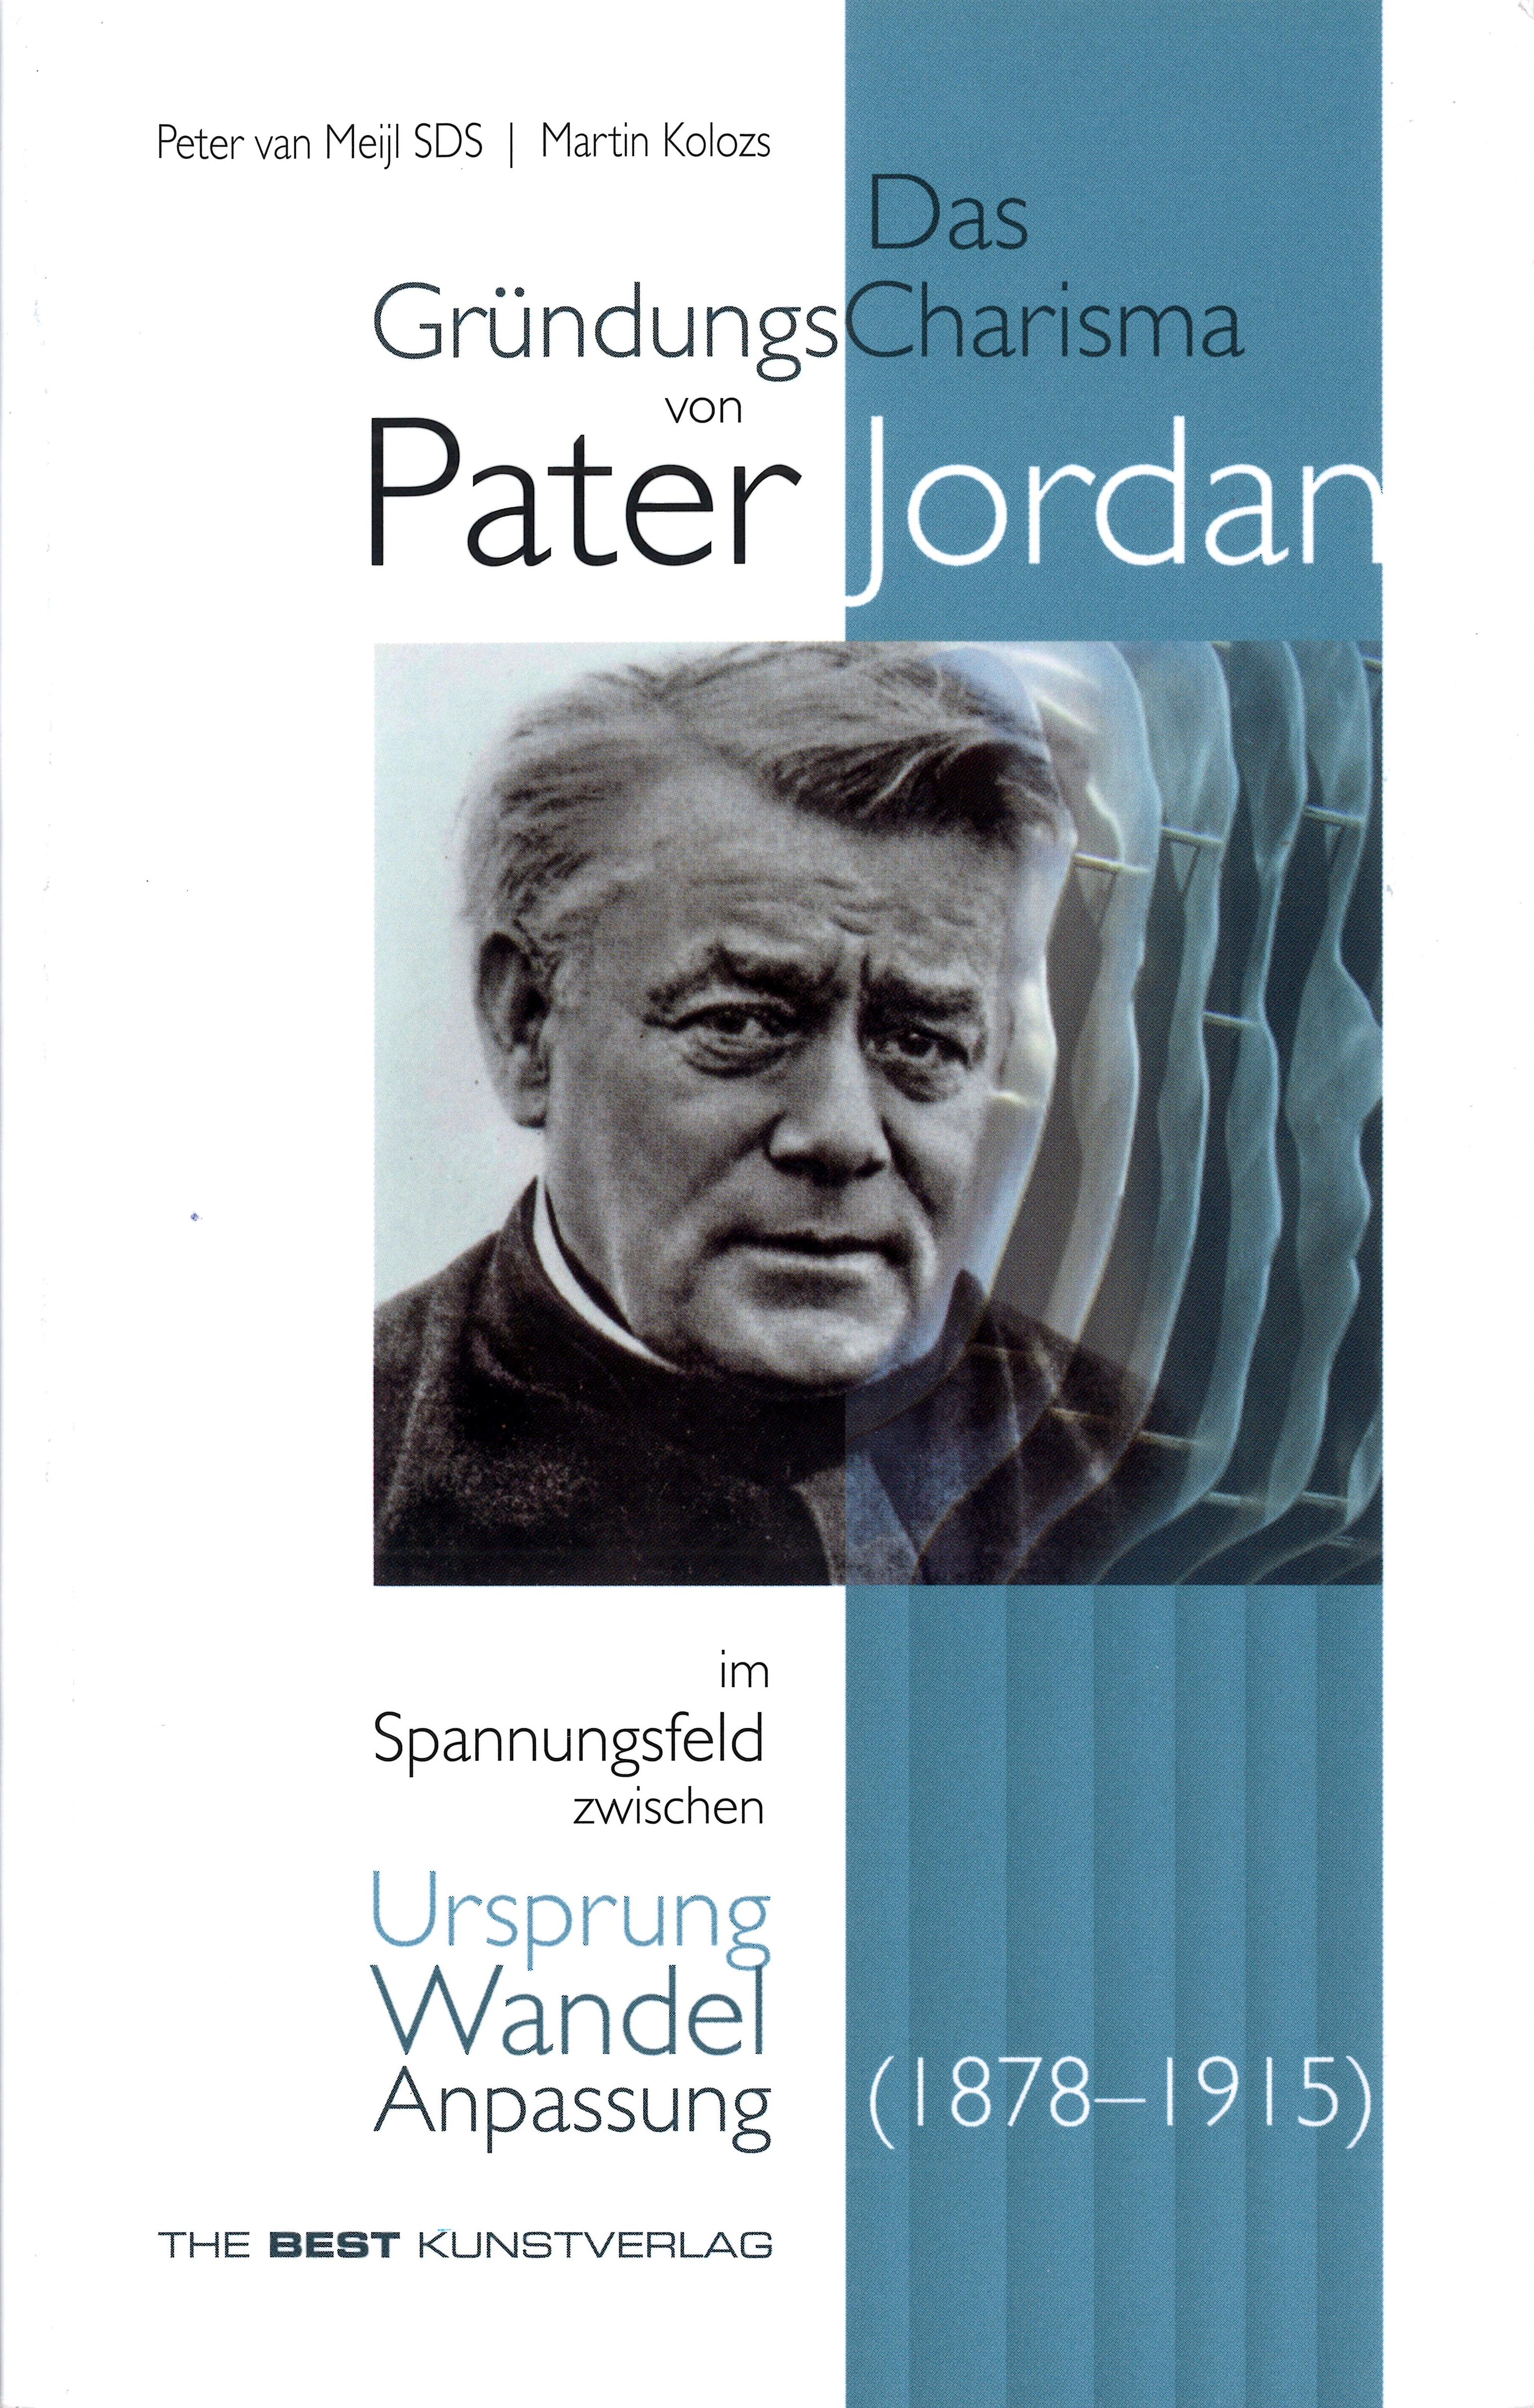 Das Gründungscharisma von Pater Jordan